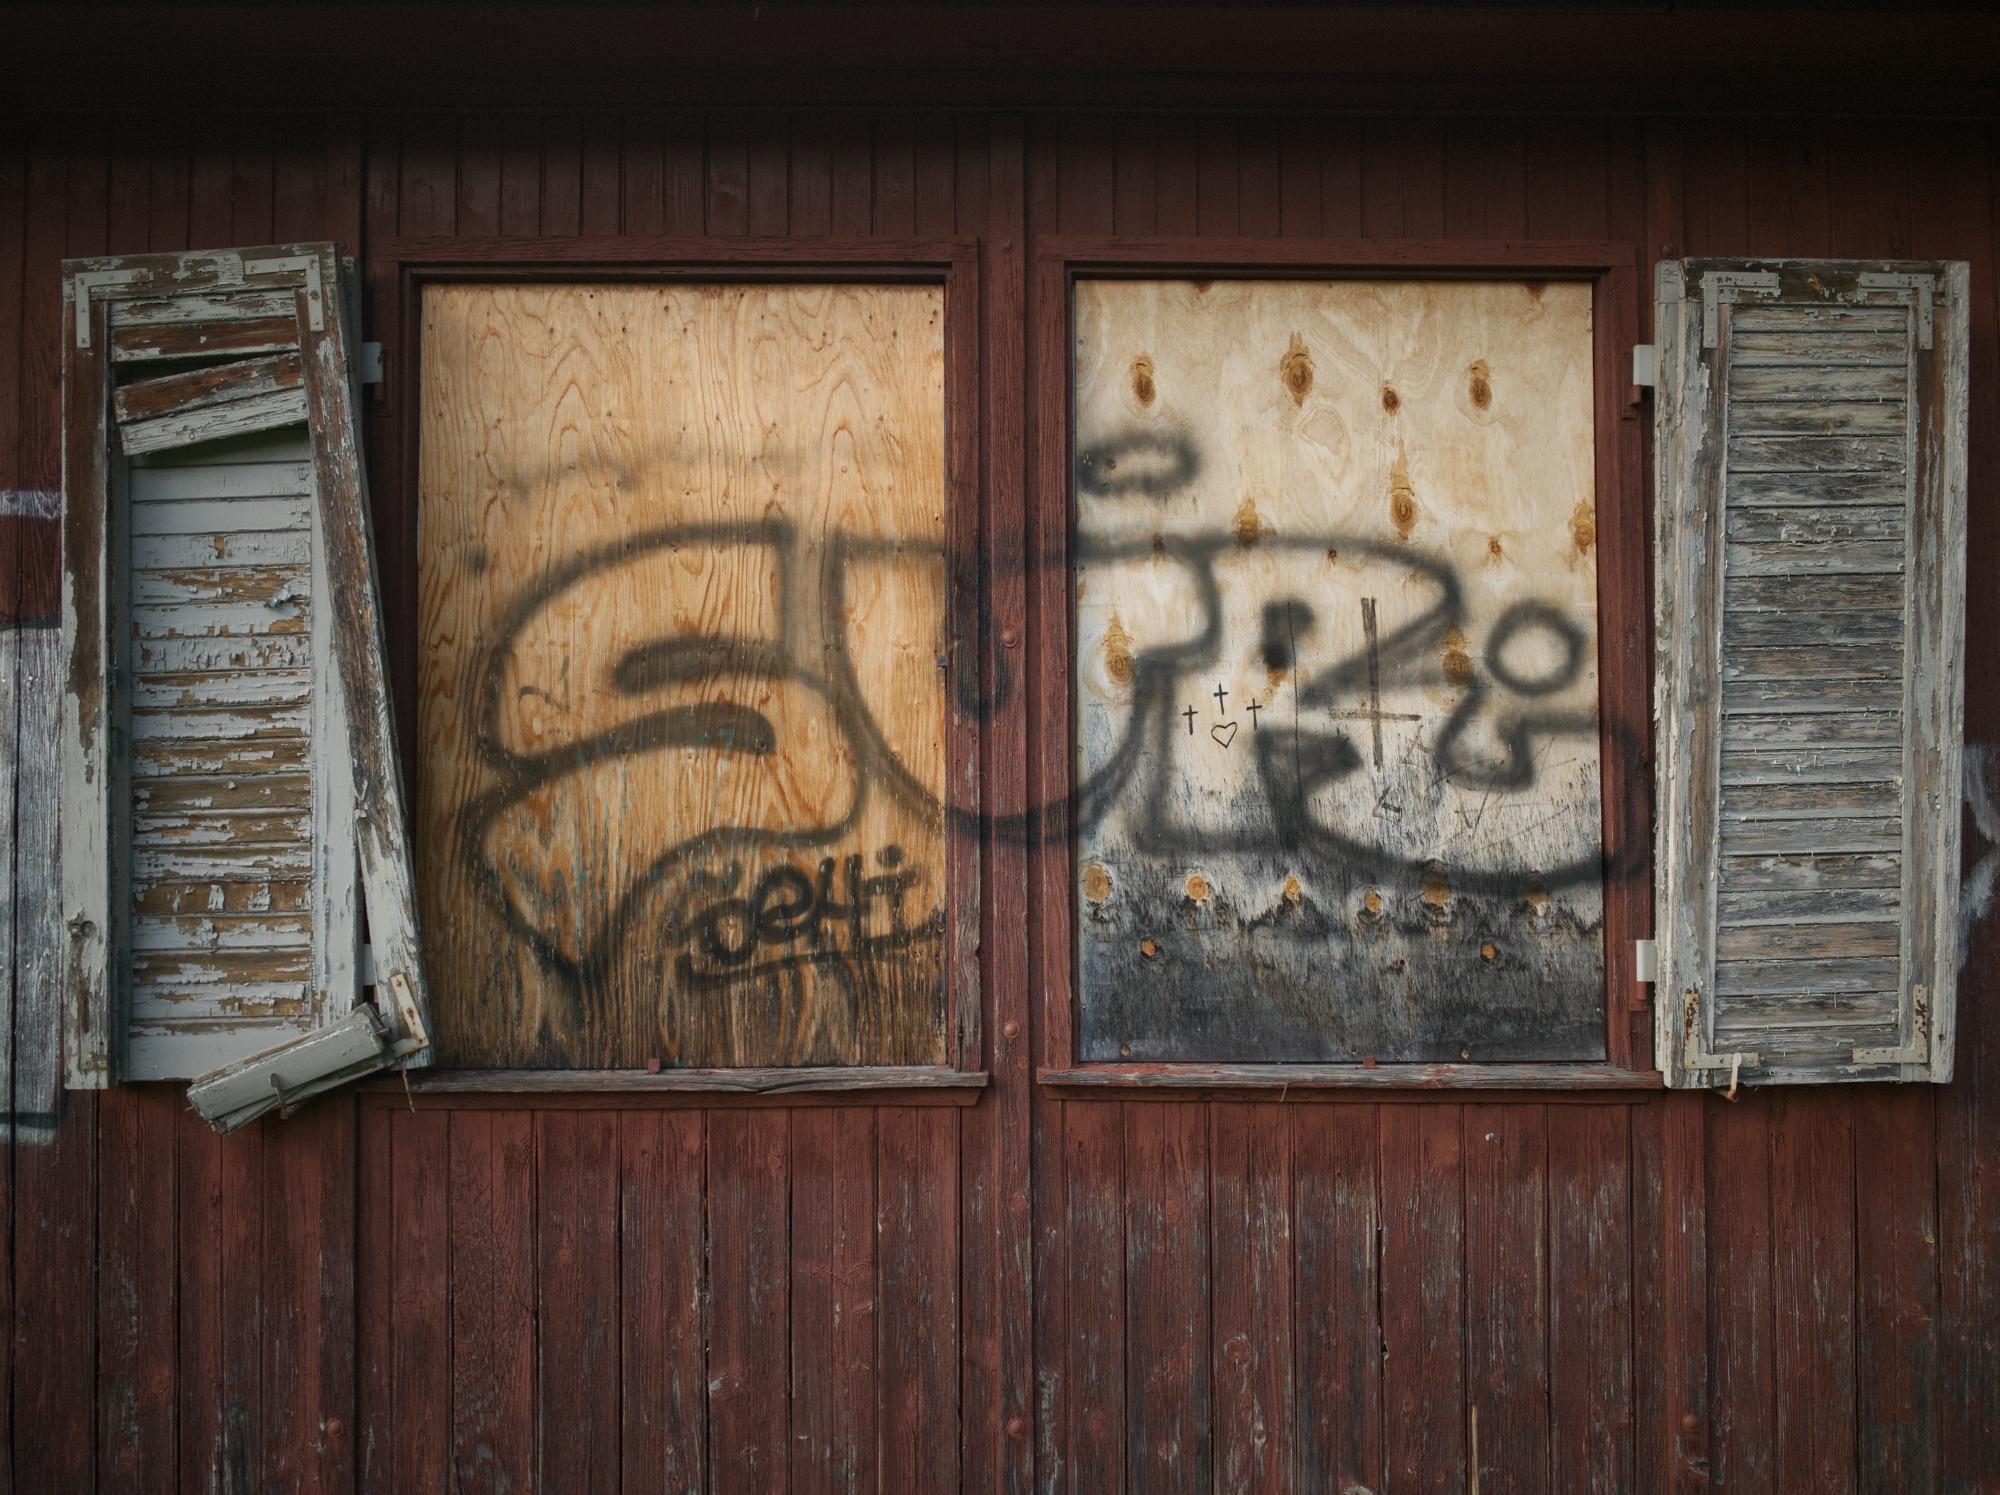 Seraglio - photography, brokensymmetries - marcushammerschmitt | ello